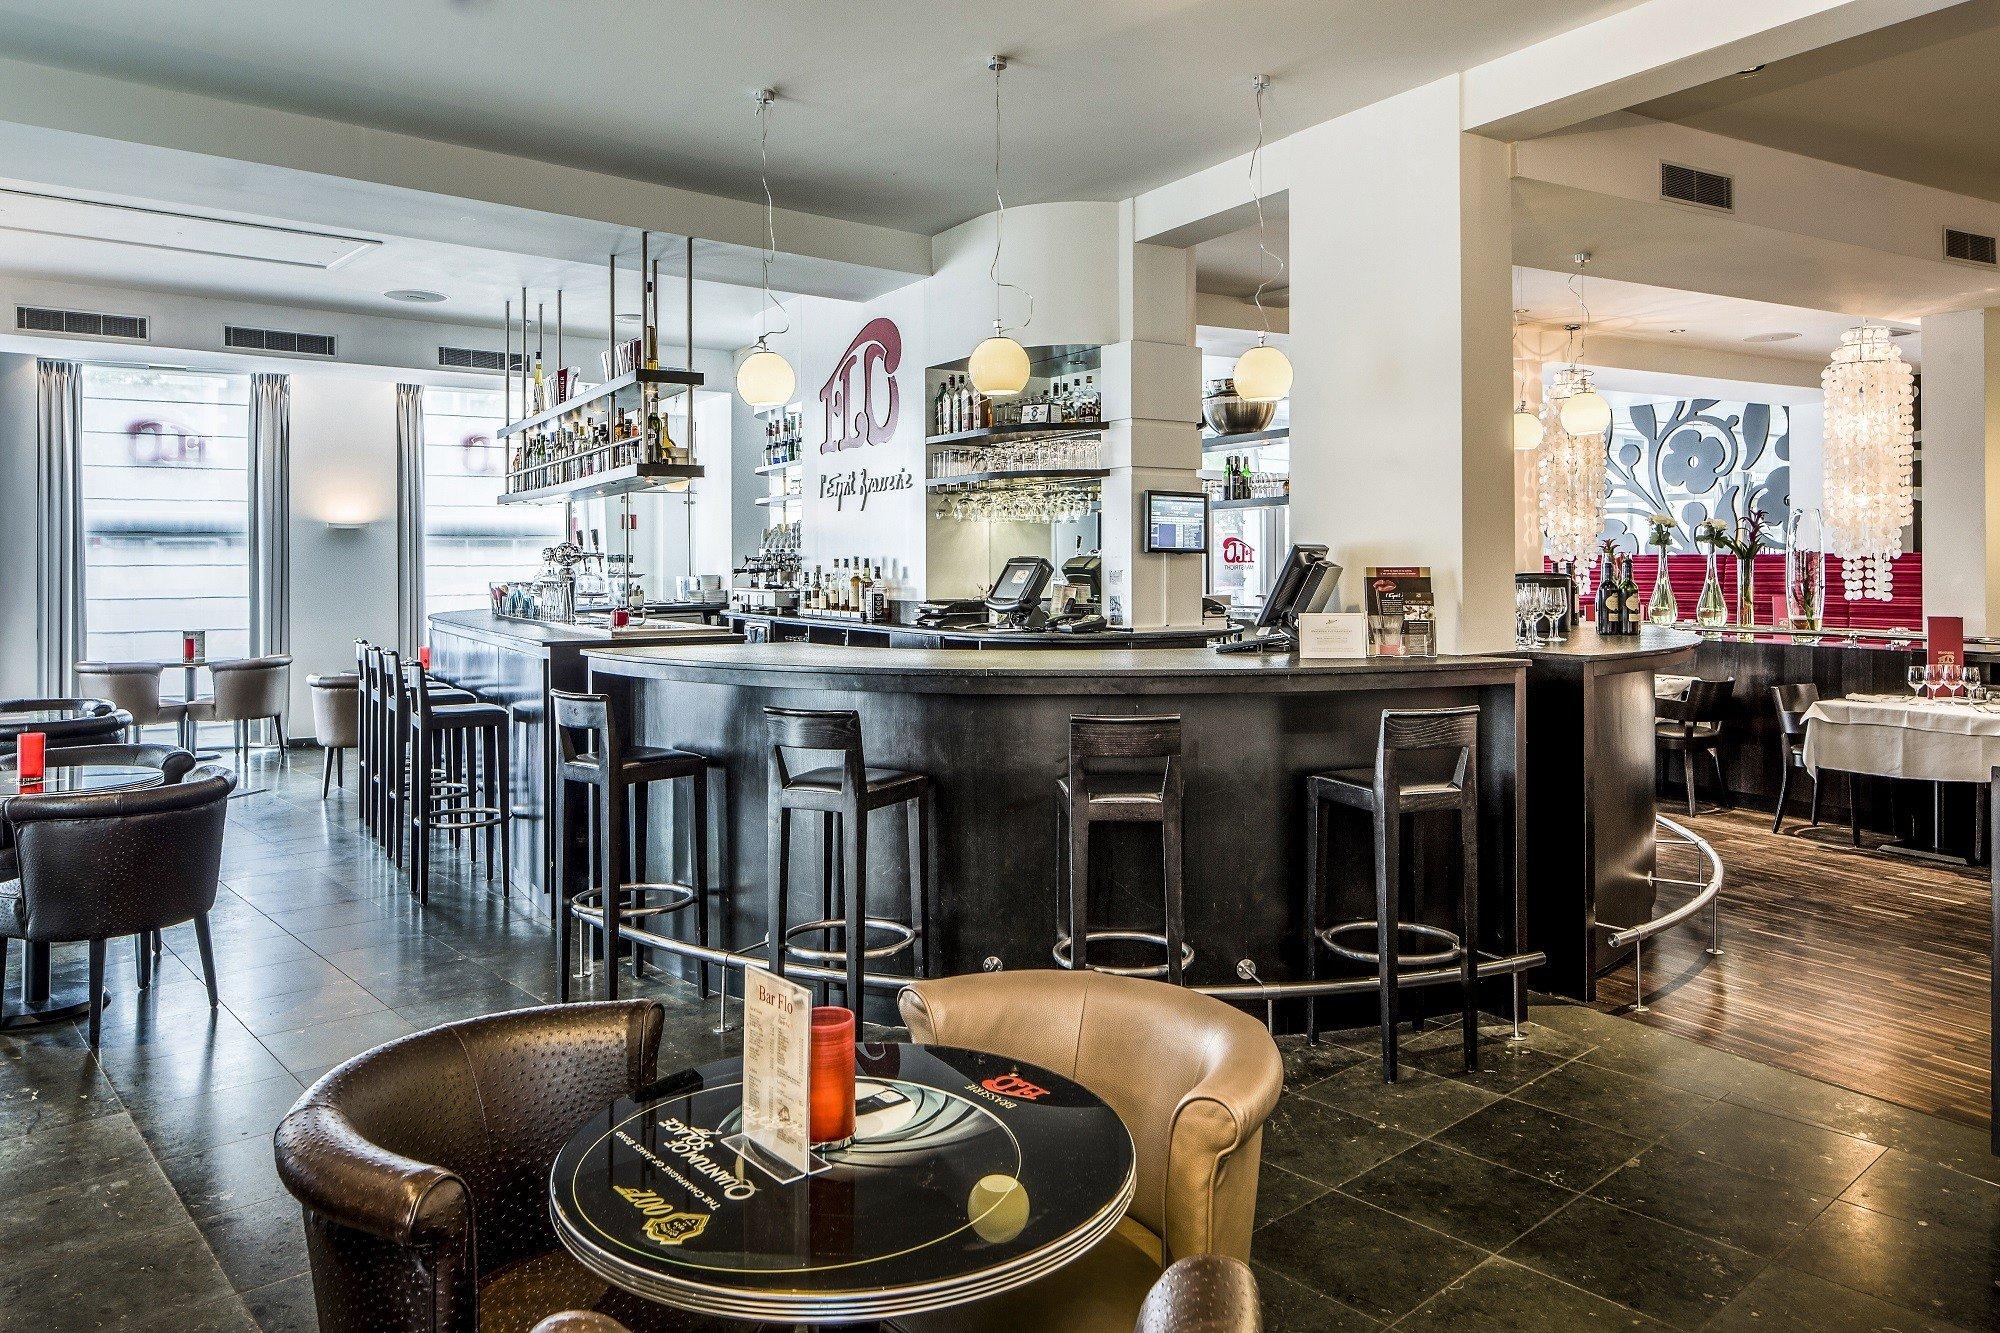 Dagaanbieding - 3 dagen 4*-designhotel in hartje Maastricht incl. diner en leuke extra's! dagelijkse koopjes